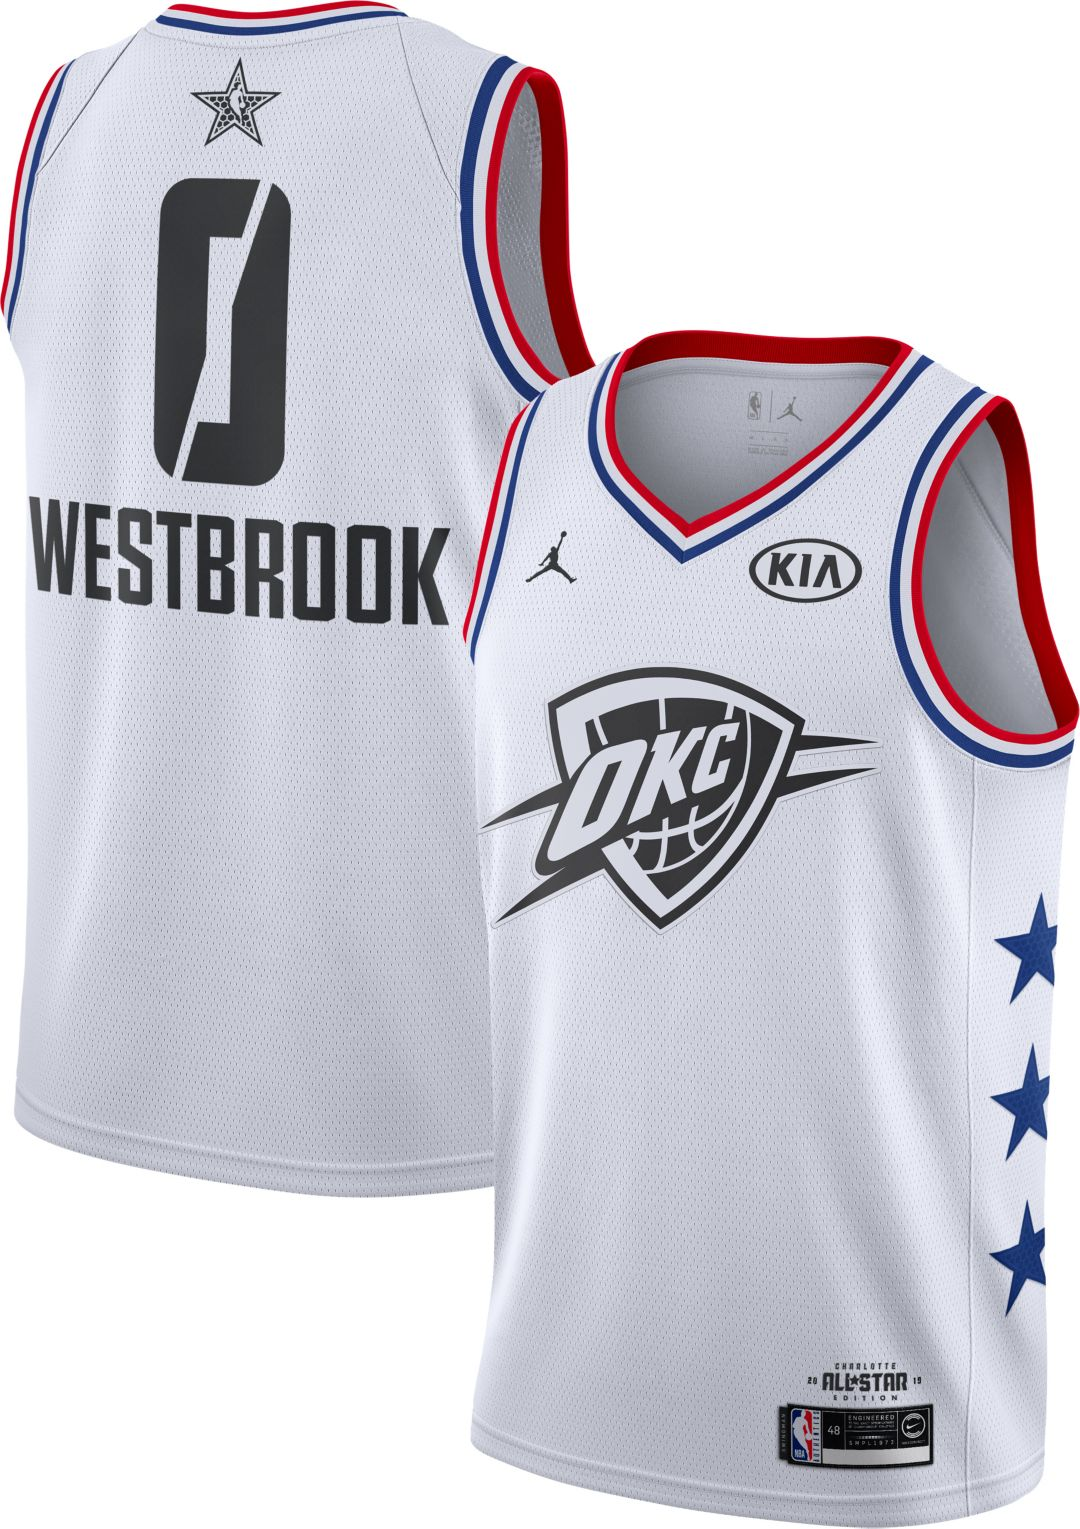 77c4d6fe1 Jordan Men s 2019 NBA All-Star Game Russell Westbrook White Dri-FIT  Swingman Jersey